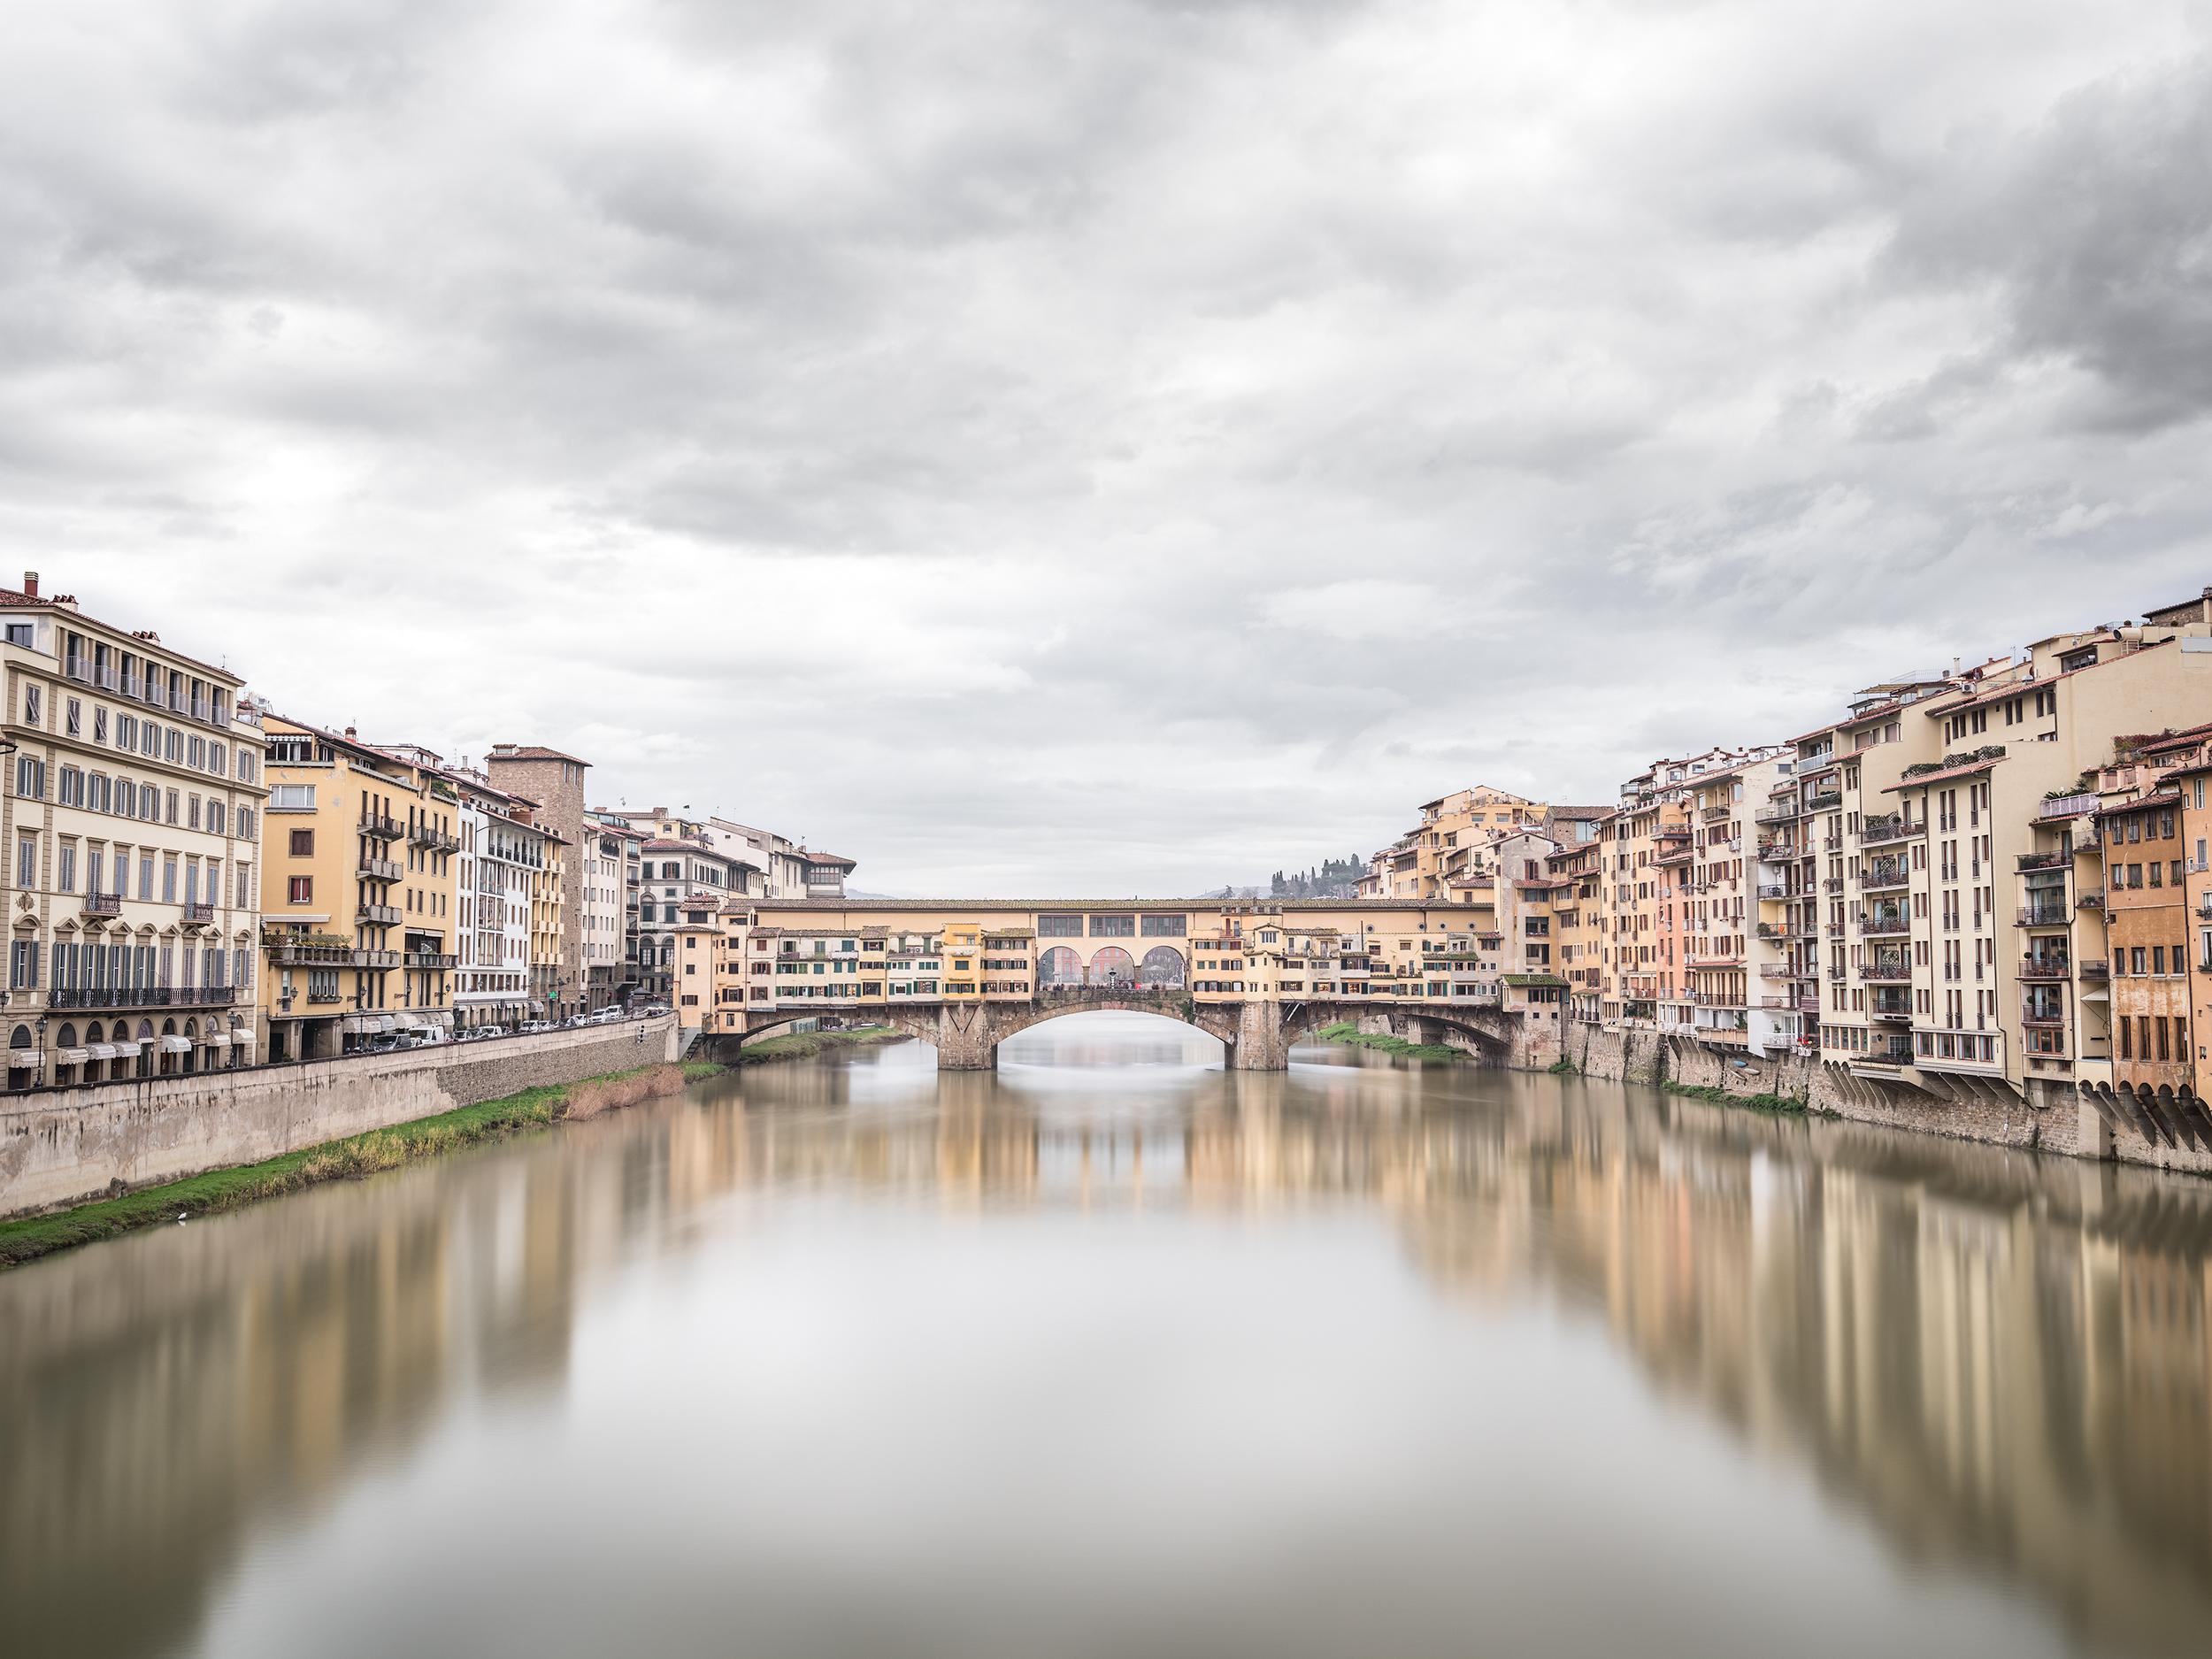 Ponte Vecchio (2989-91 )